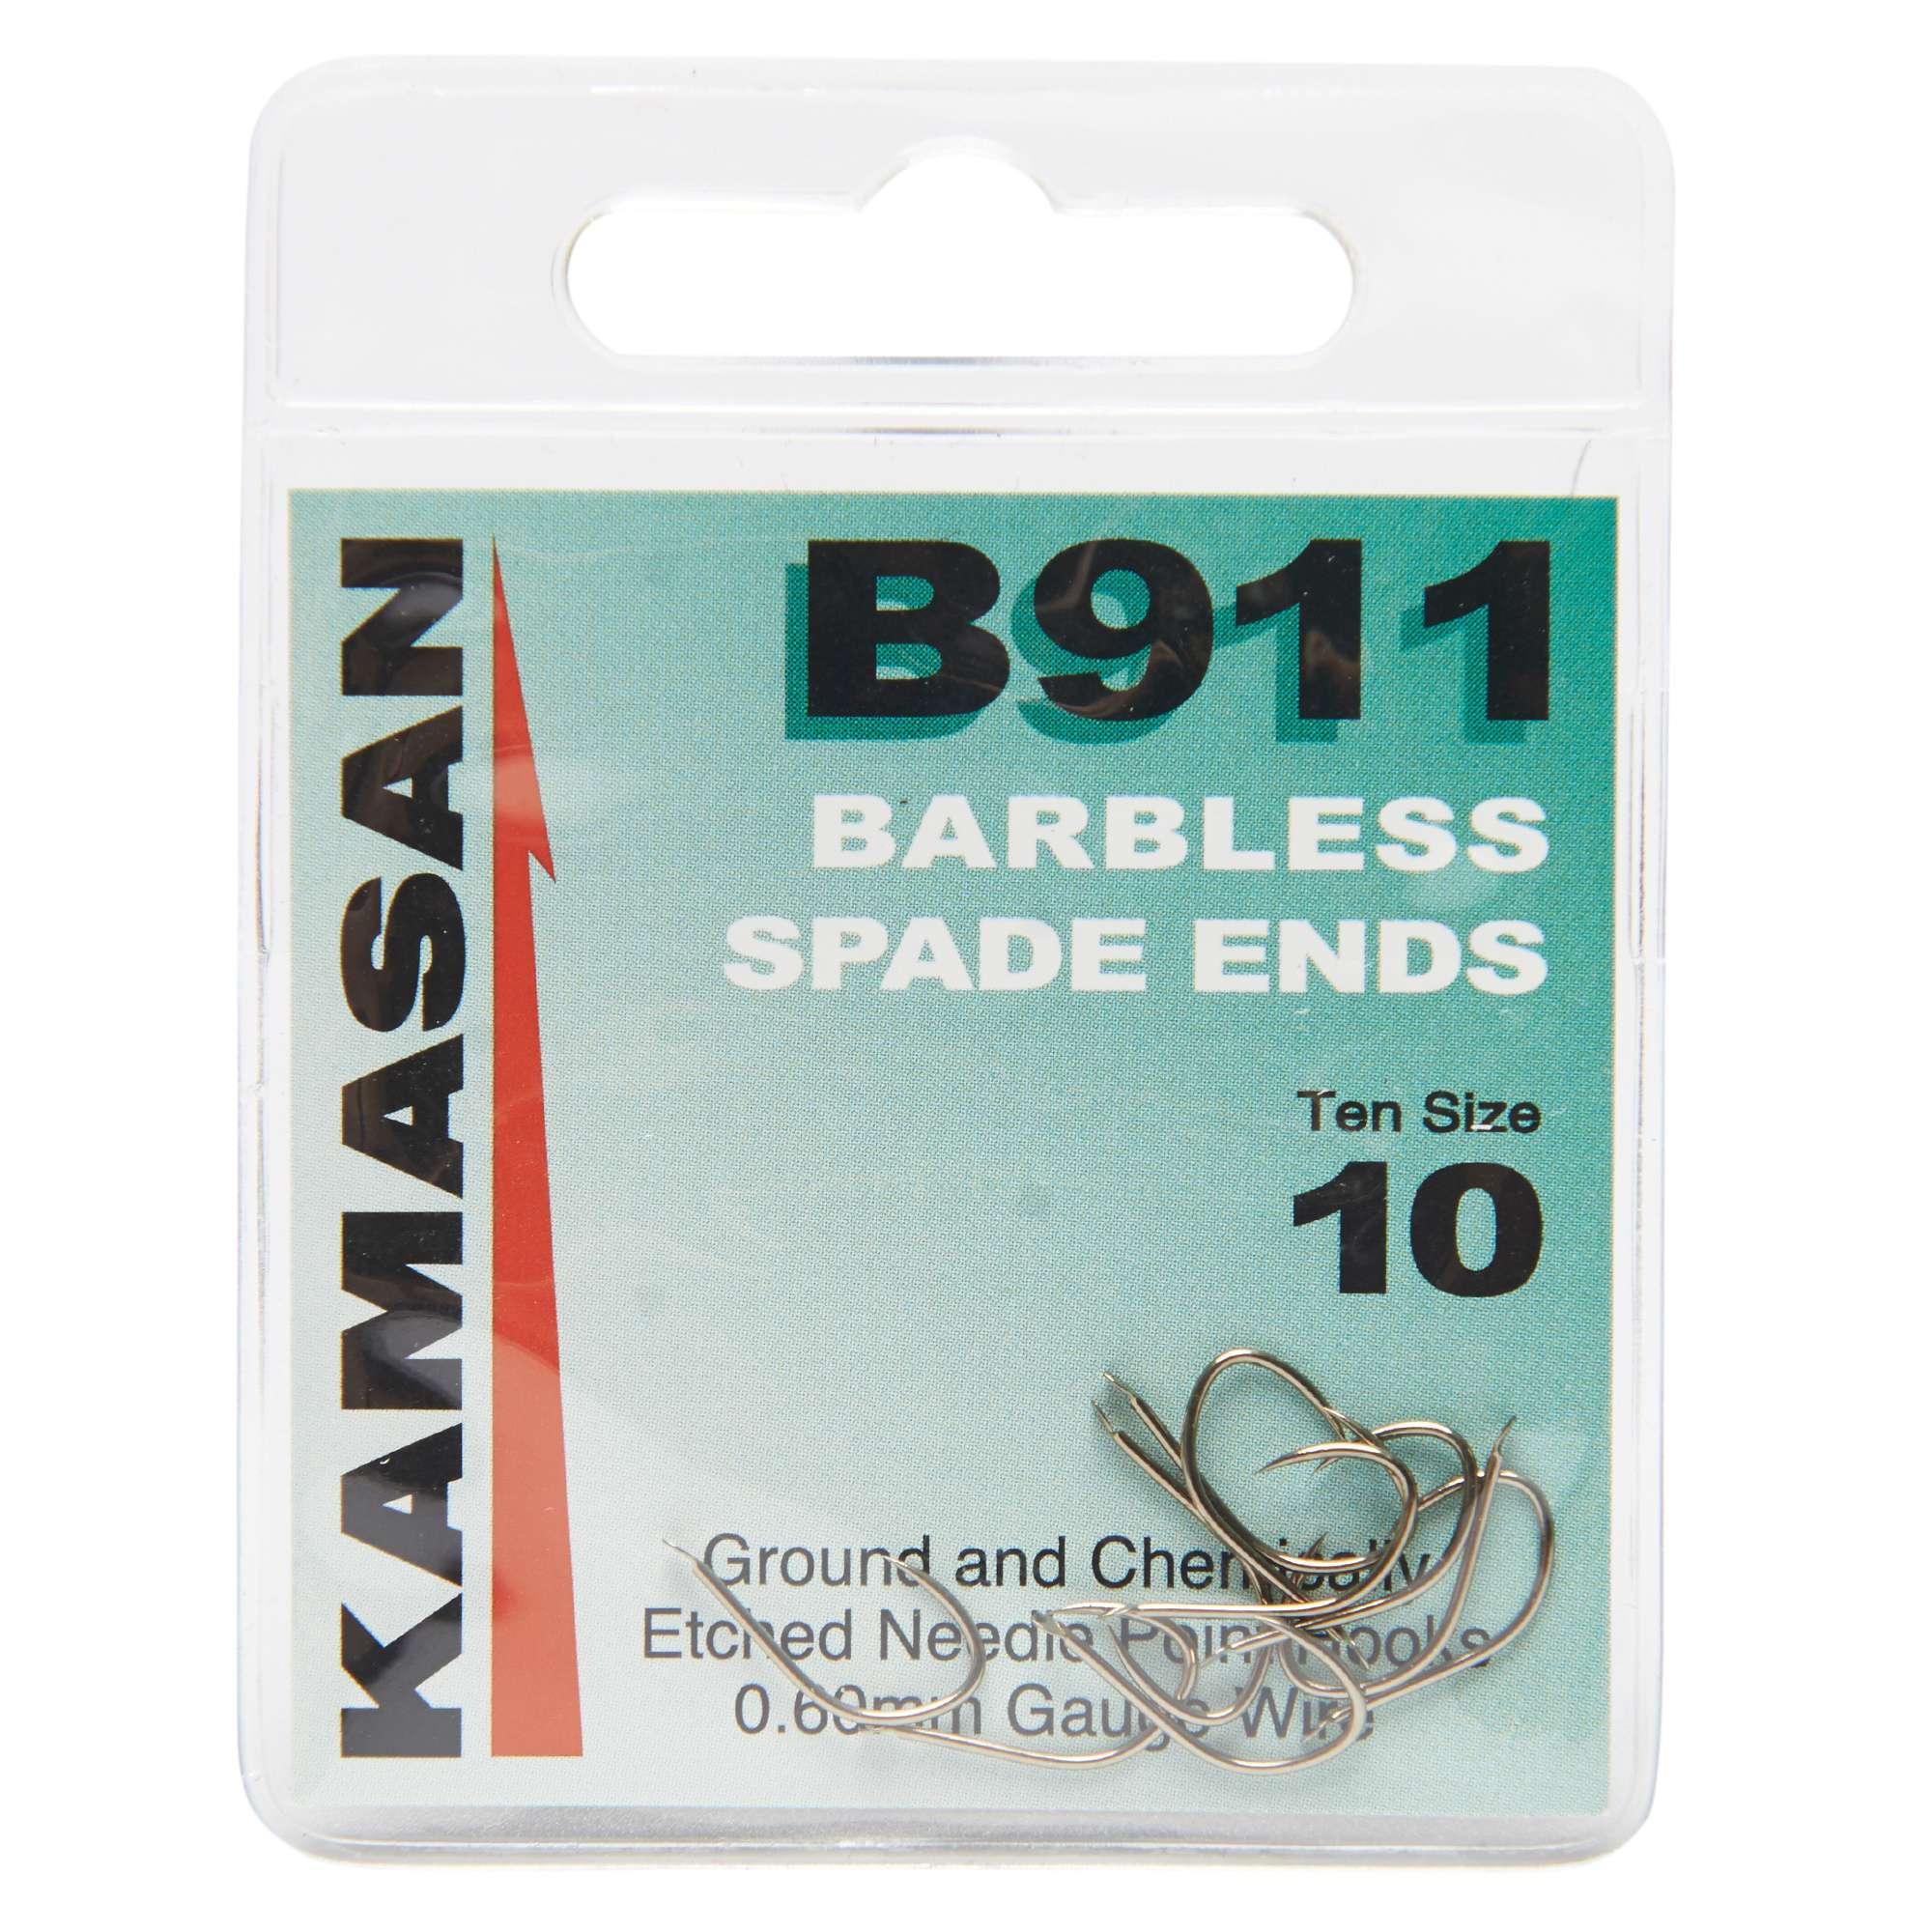 KAMASAN B911 Extra Strong Spade Fishing Hooks - Size 10